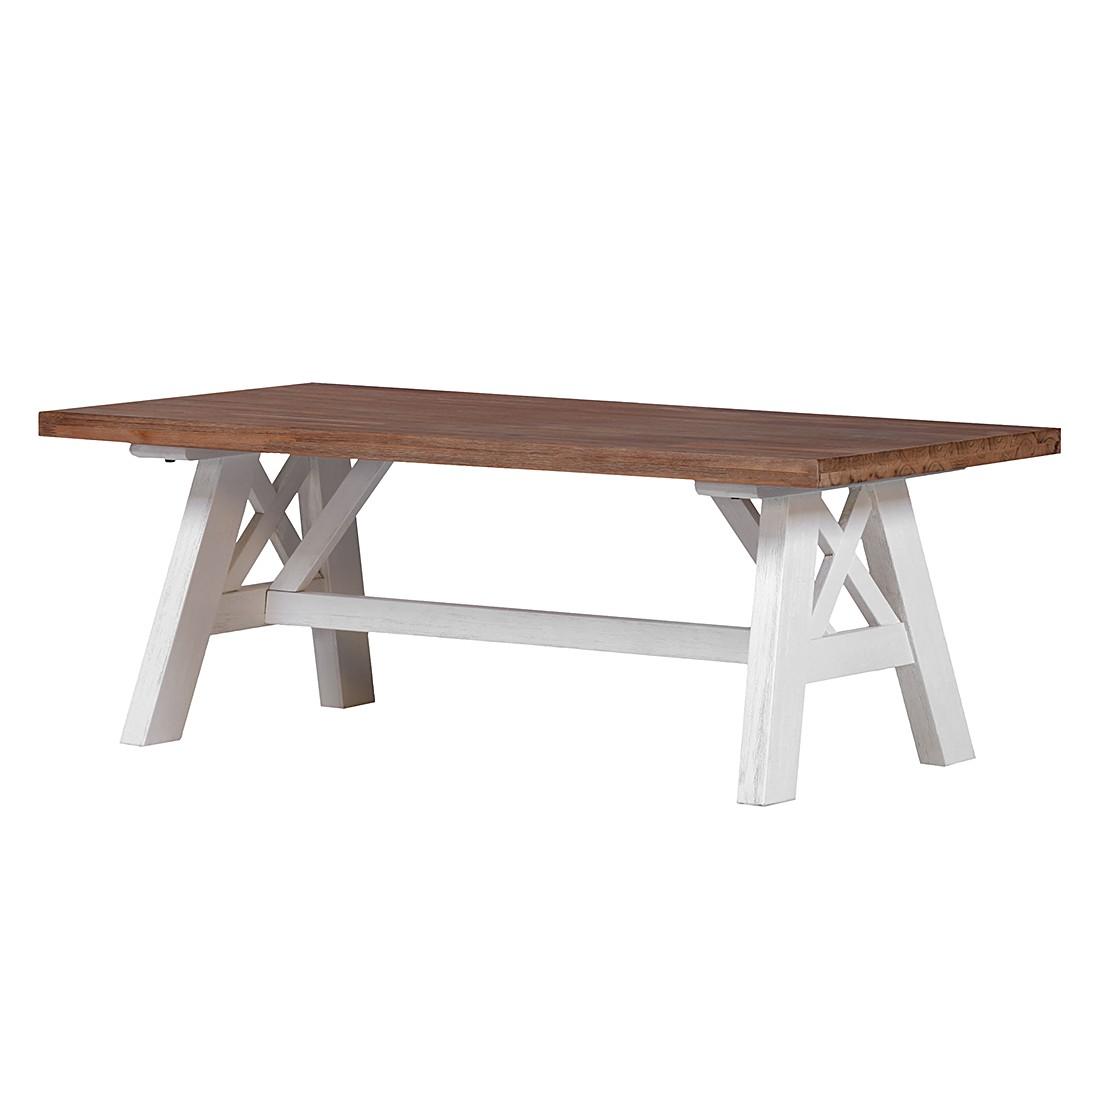 Table basse Akazia - Partiellement en acacia massif - Verni, Ridgevalley